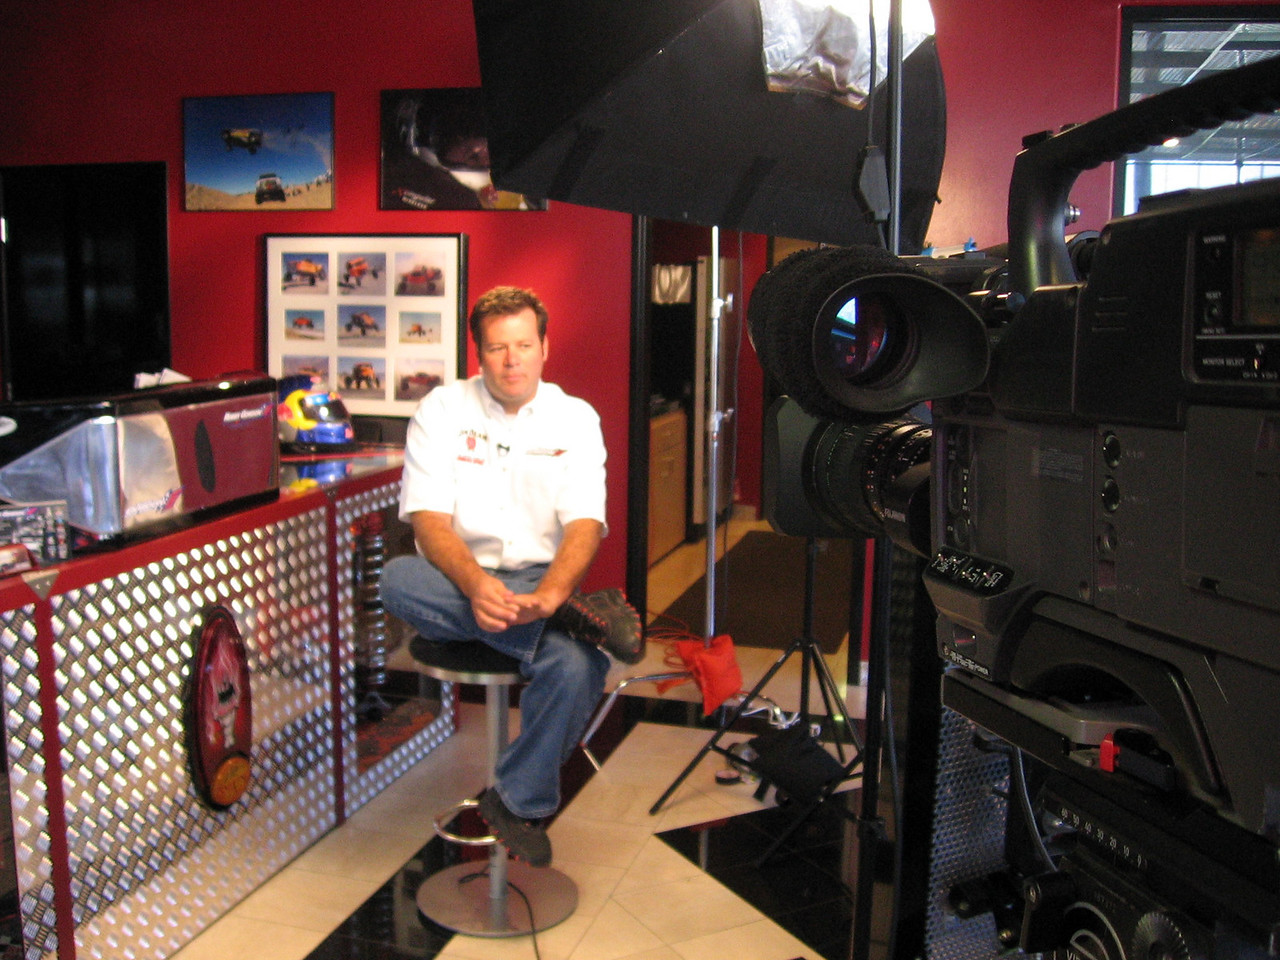 Nascar interview with Robby Gordon